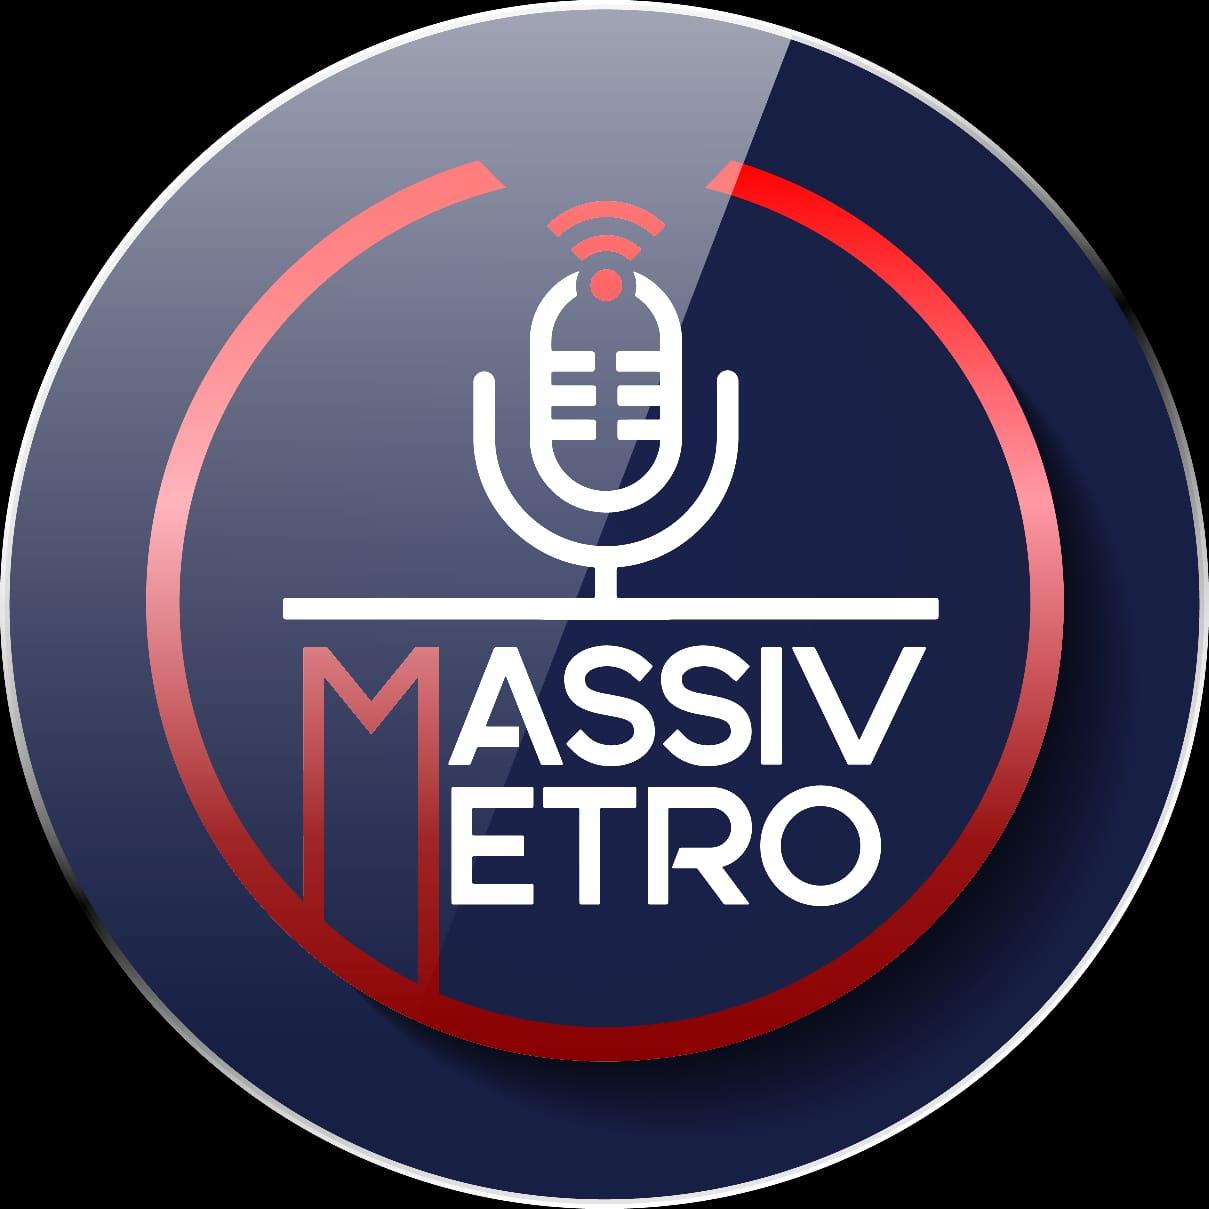 Massive Metro logo